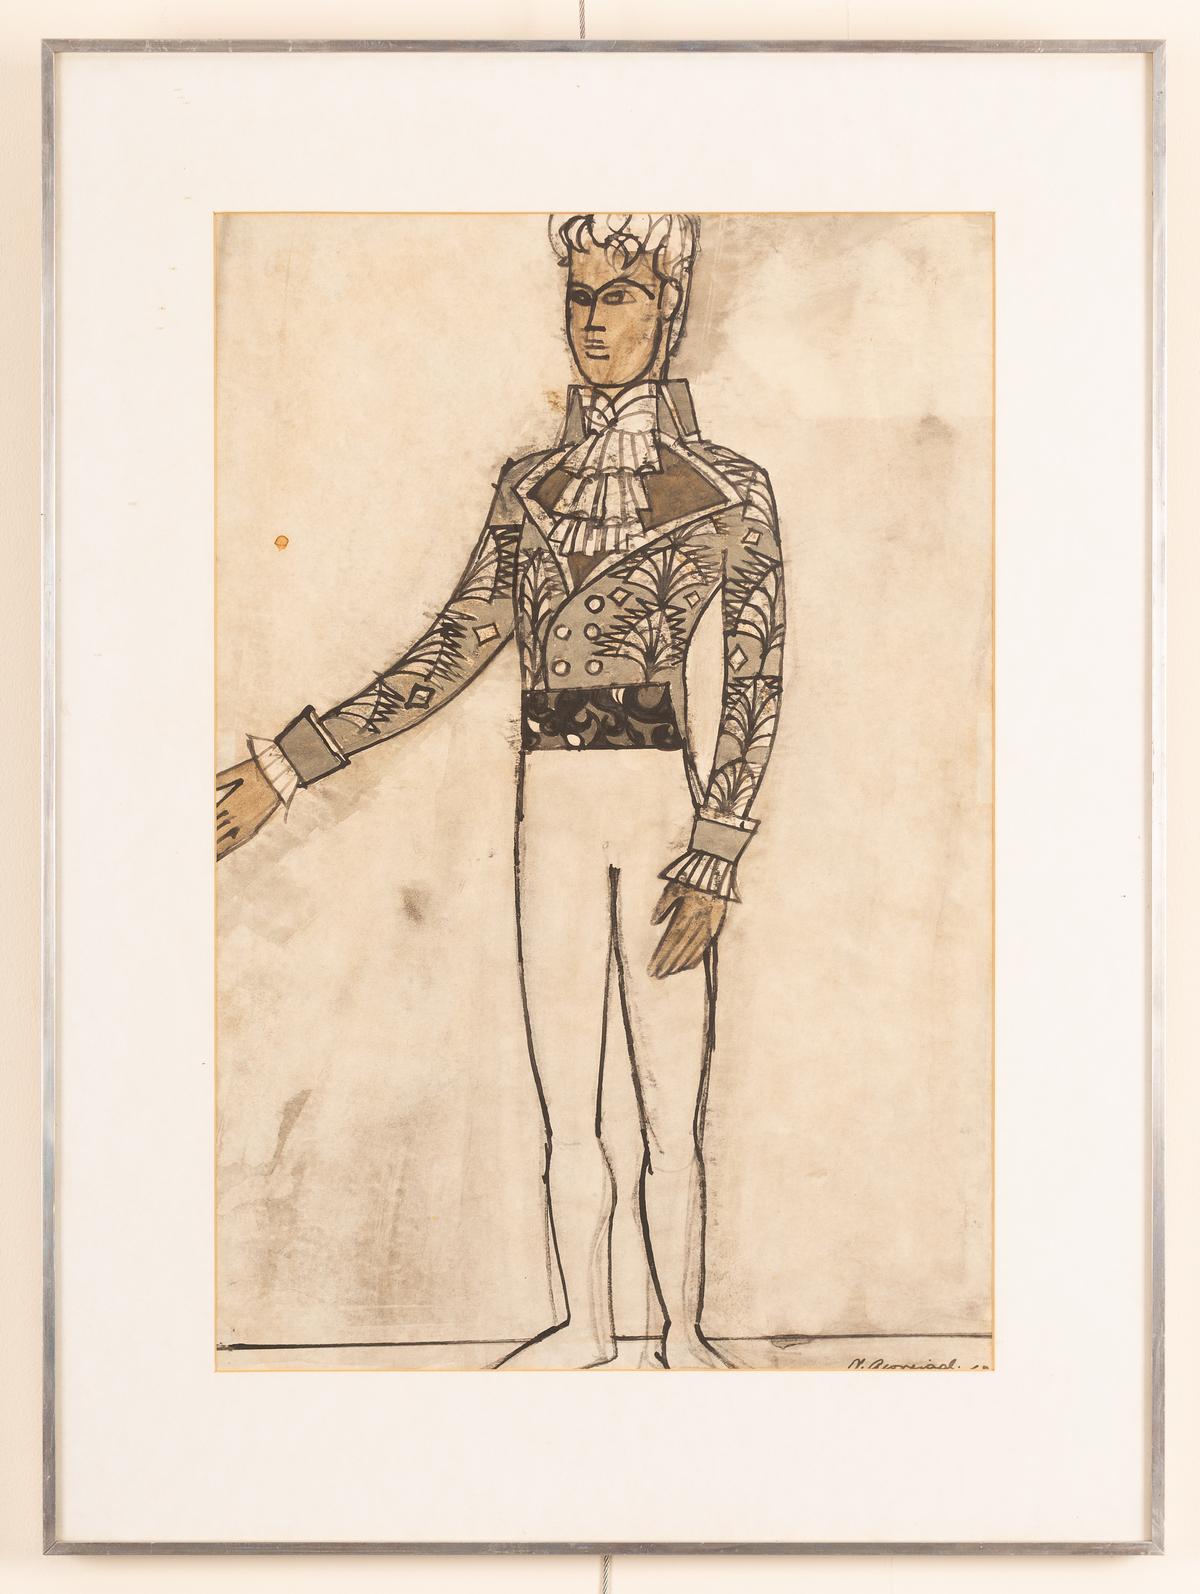 Nicholas Georgiadis (1923-2001)/Design for Rudolf Nureyev's costume in 'Nutcracker', - Image 2 of 2